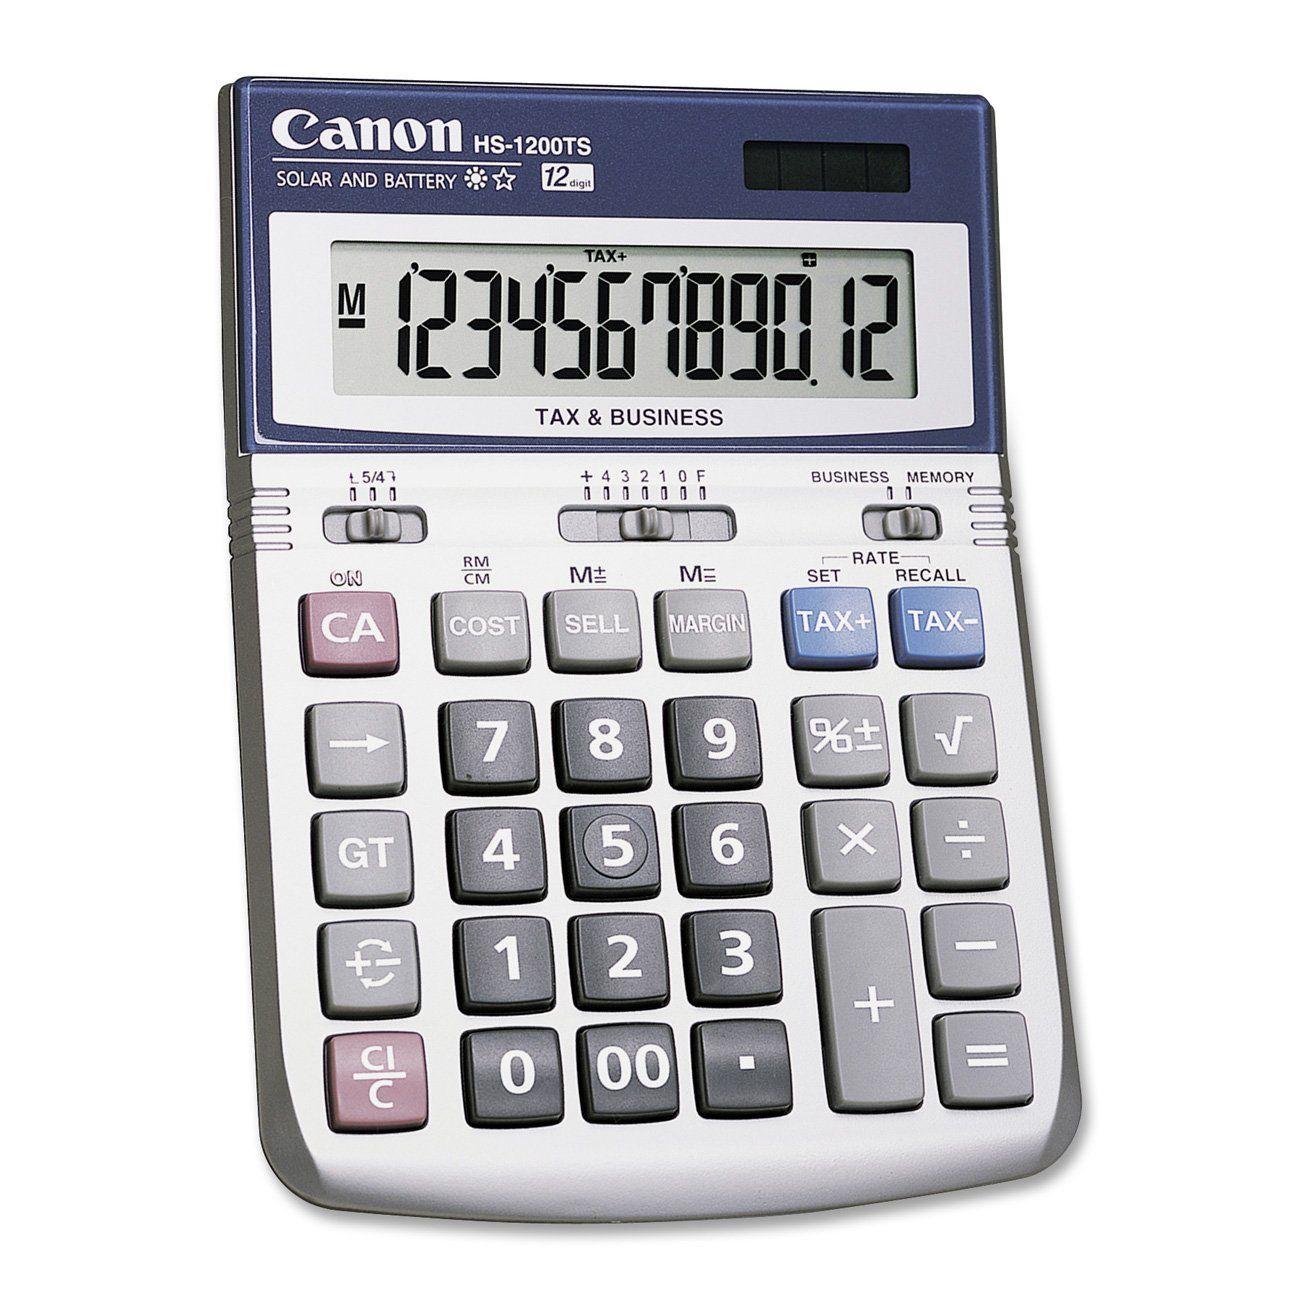 Canon office products hs 1200ts business calculator calculators calculator biocorpaavc